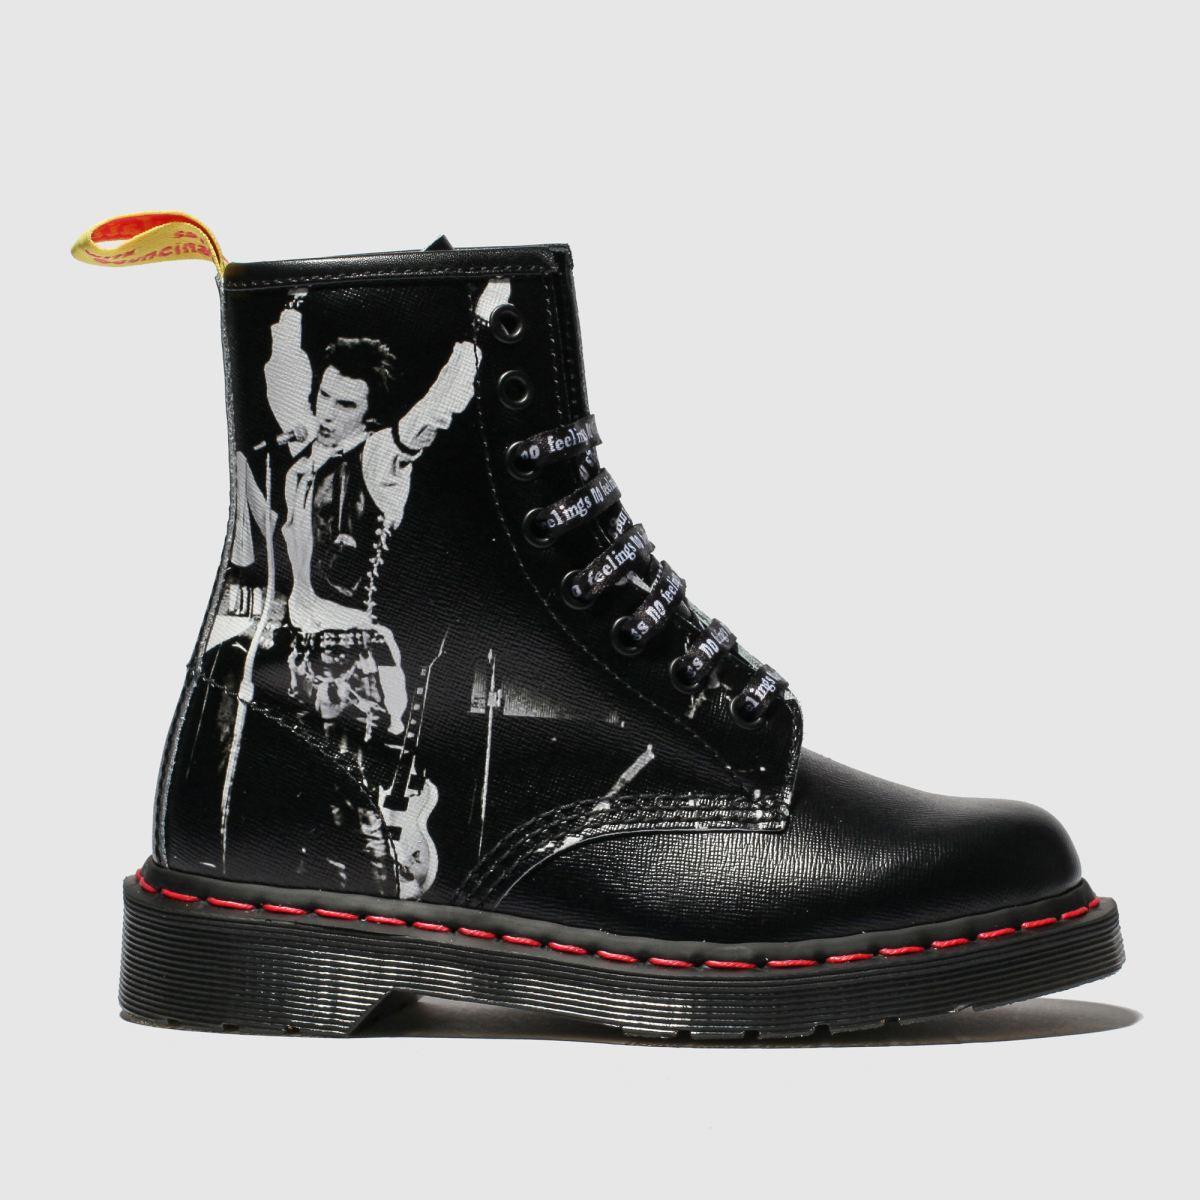 Dr Martens Black & White 1460 8 Eye X Sex Pistols Boots